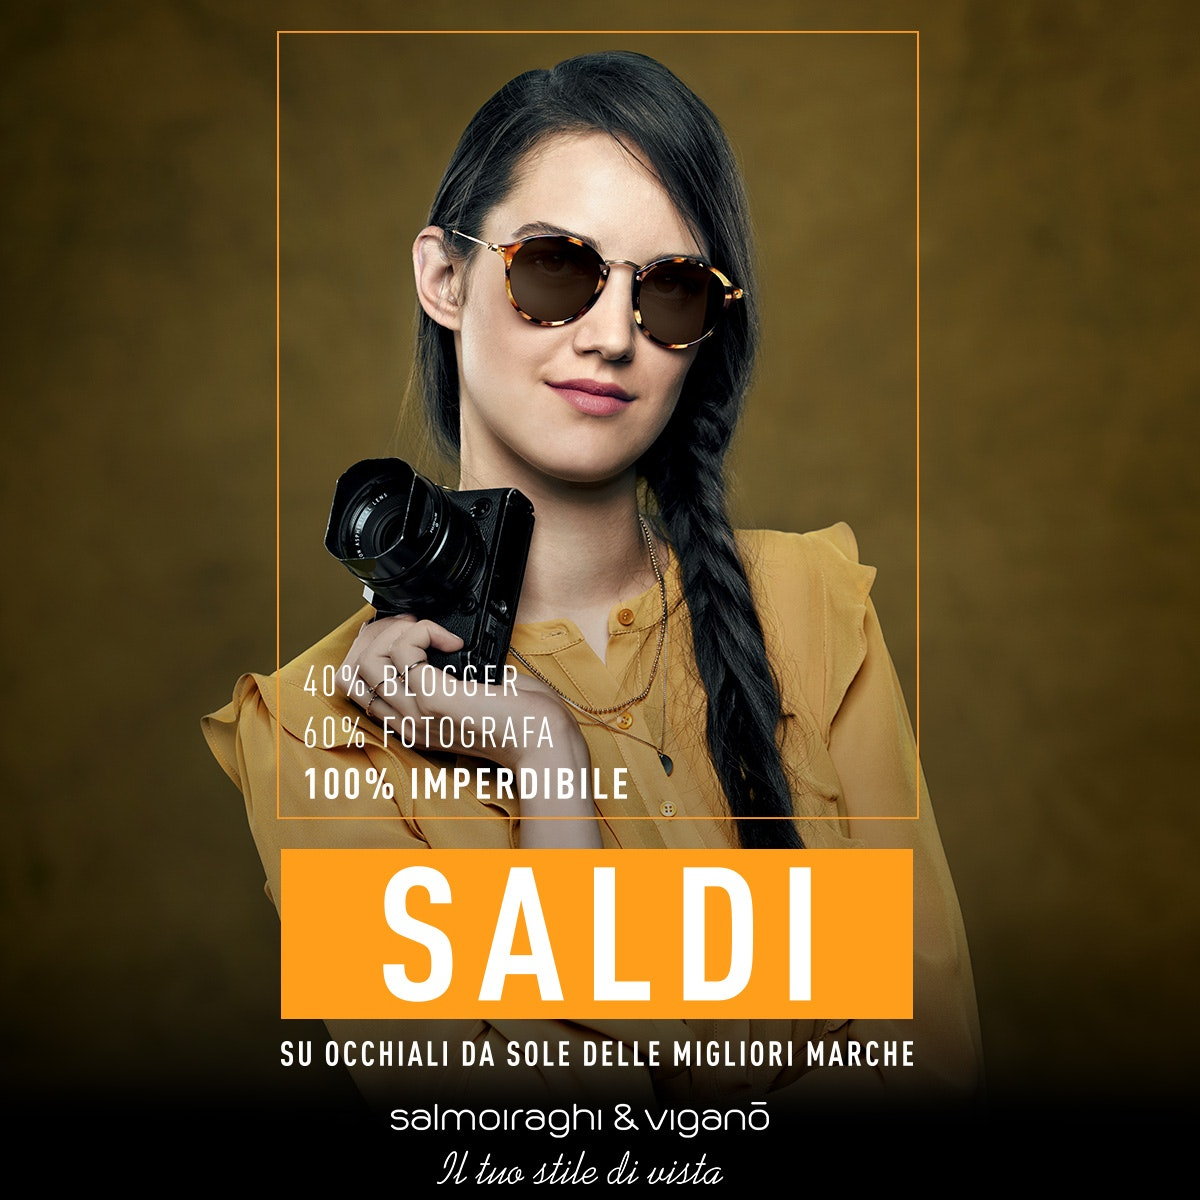 saldi_donna_s&v_1200x1200_medialab